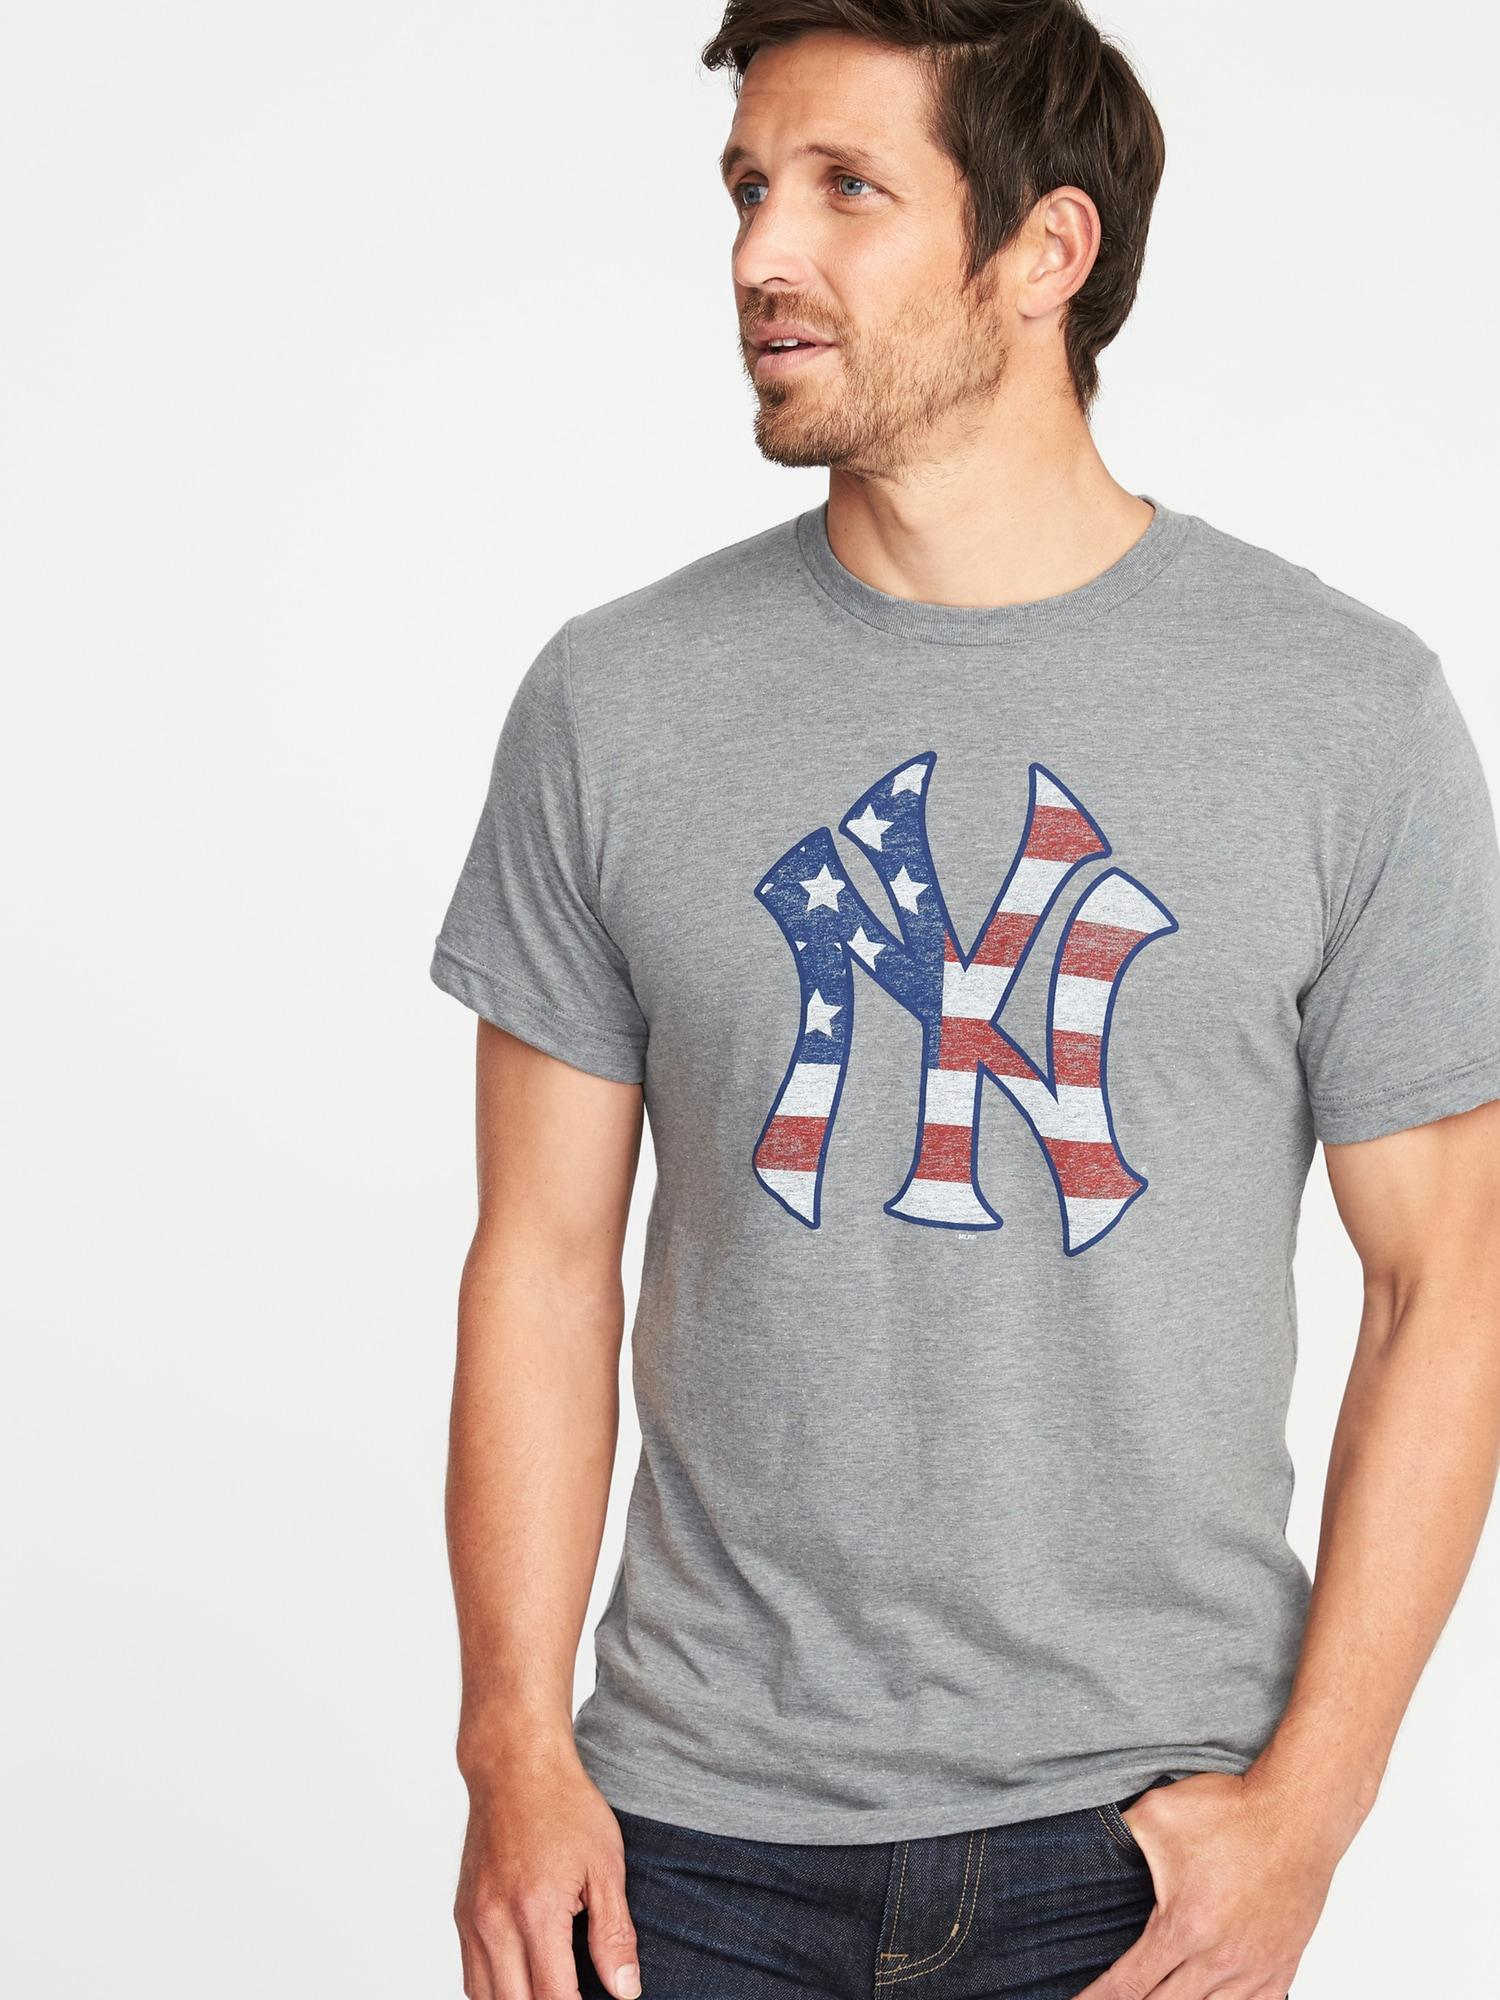 9f142240501 Lyst - Old Navy Mlb® Americana Team Tee in Gray for Men